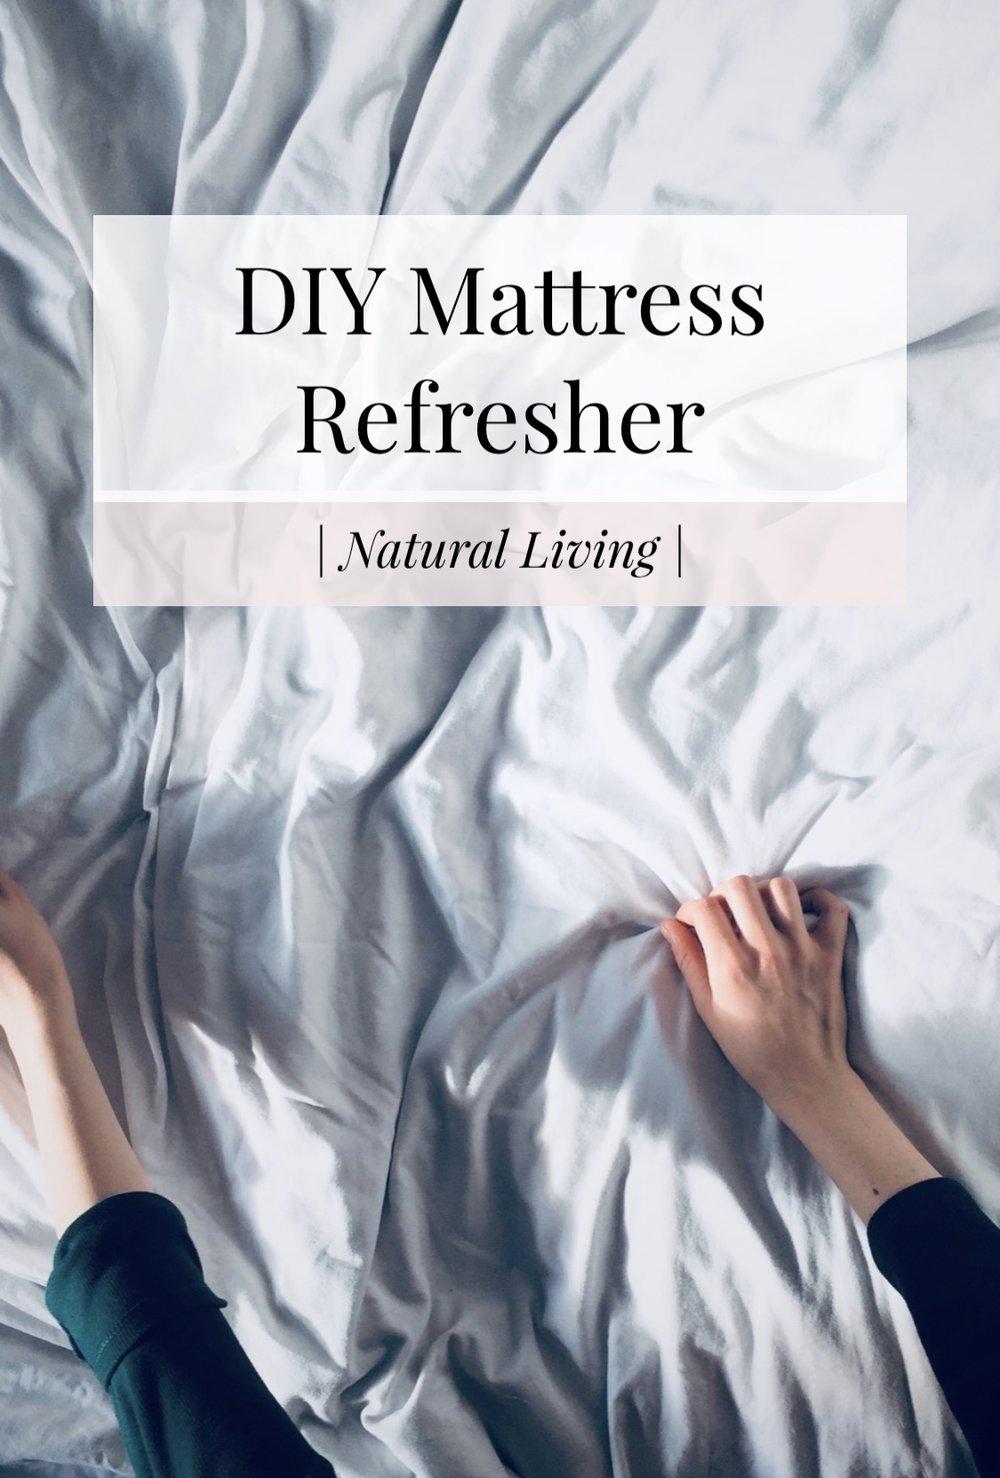 DIY Mattress refresher.jpg